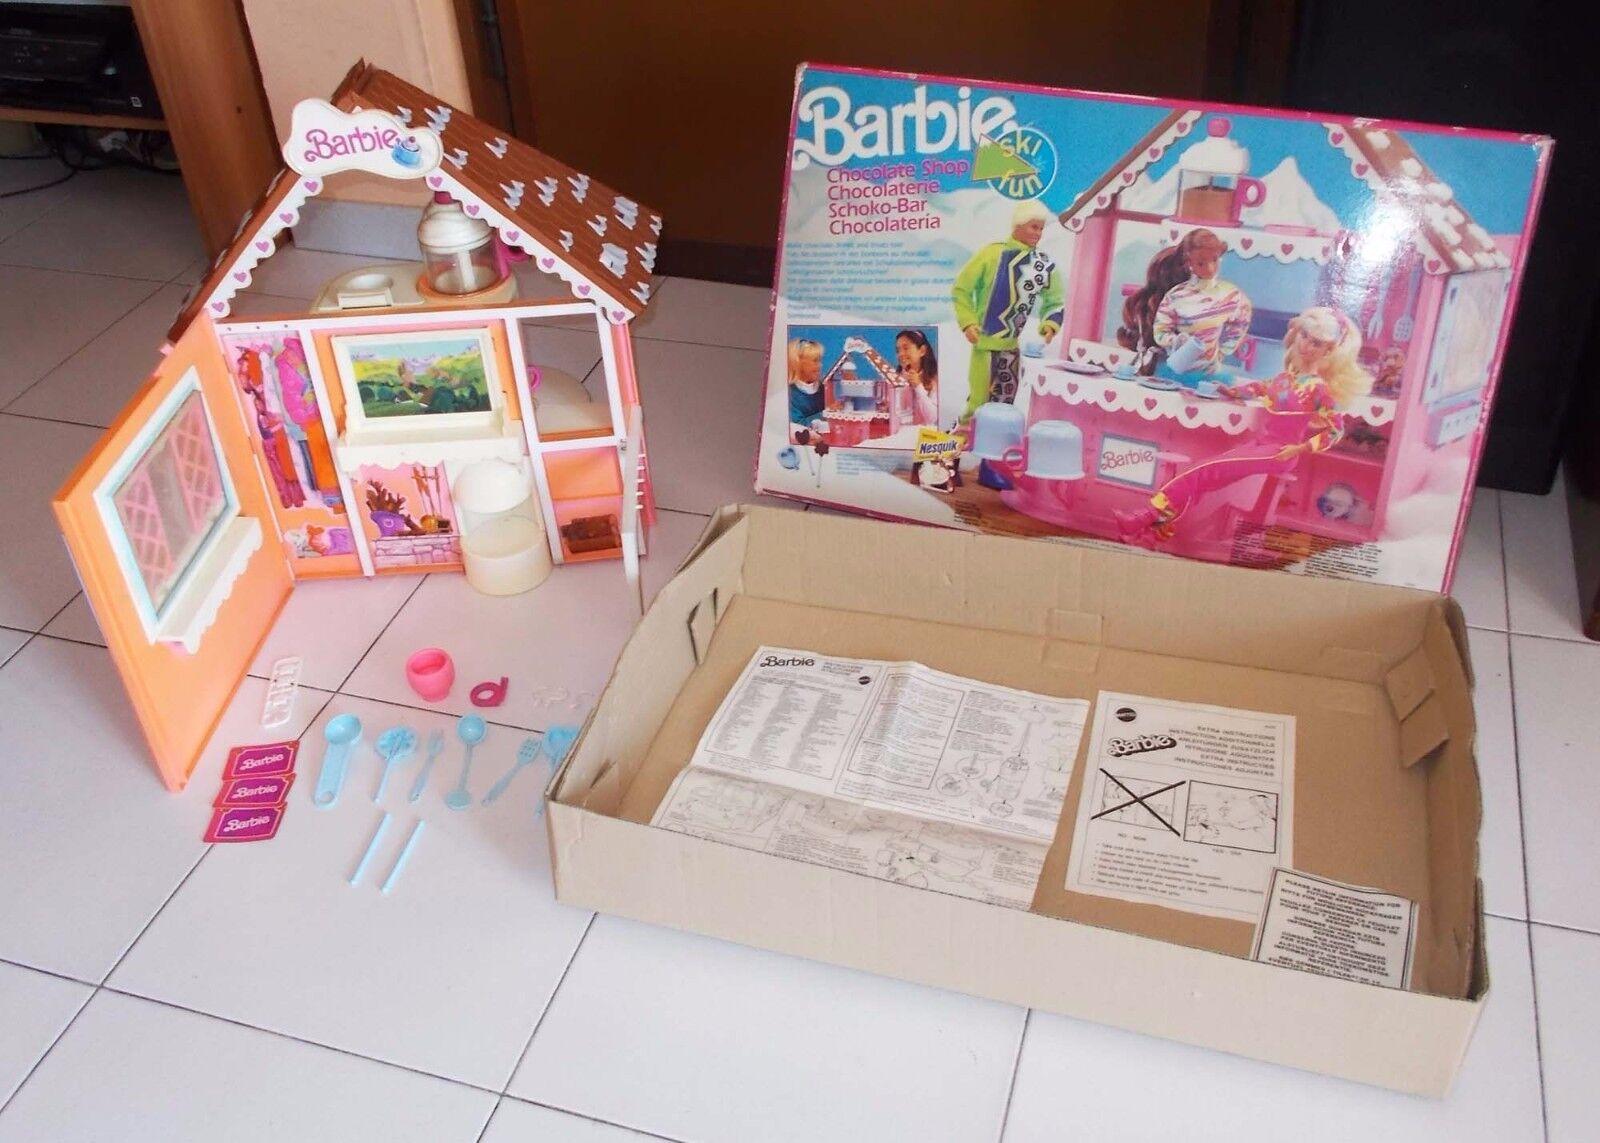 Barbie ski fun Schokolade Shop Schoko-Laden Mattel 1990 art 9698 Chocolaterie    Ruf zuerst